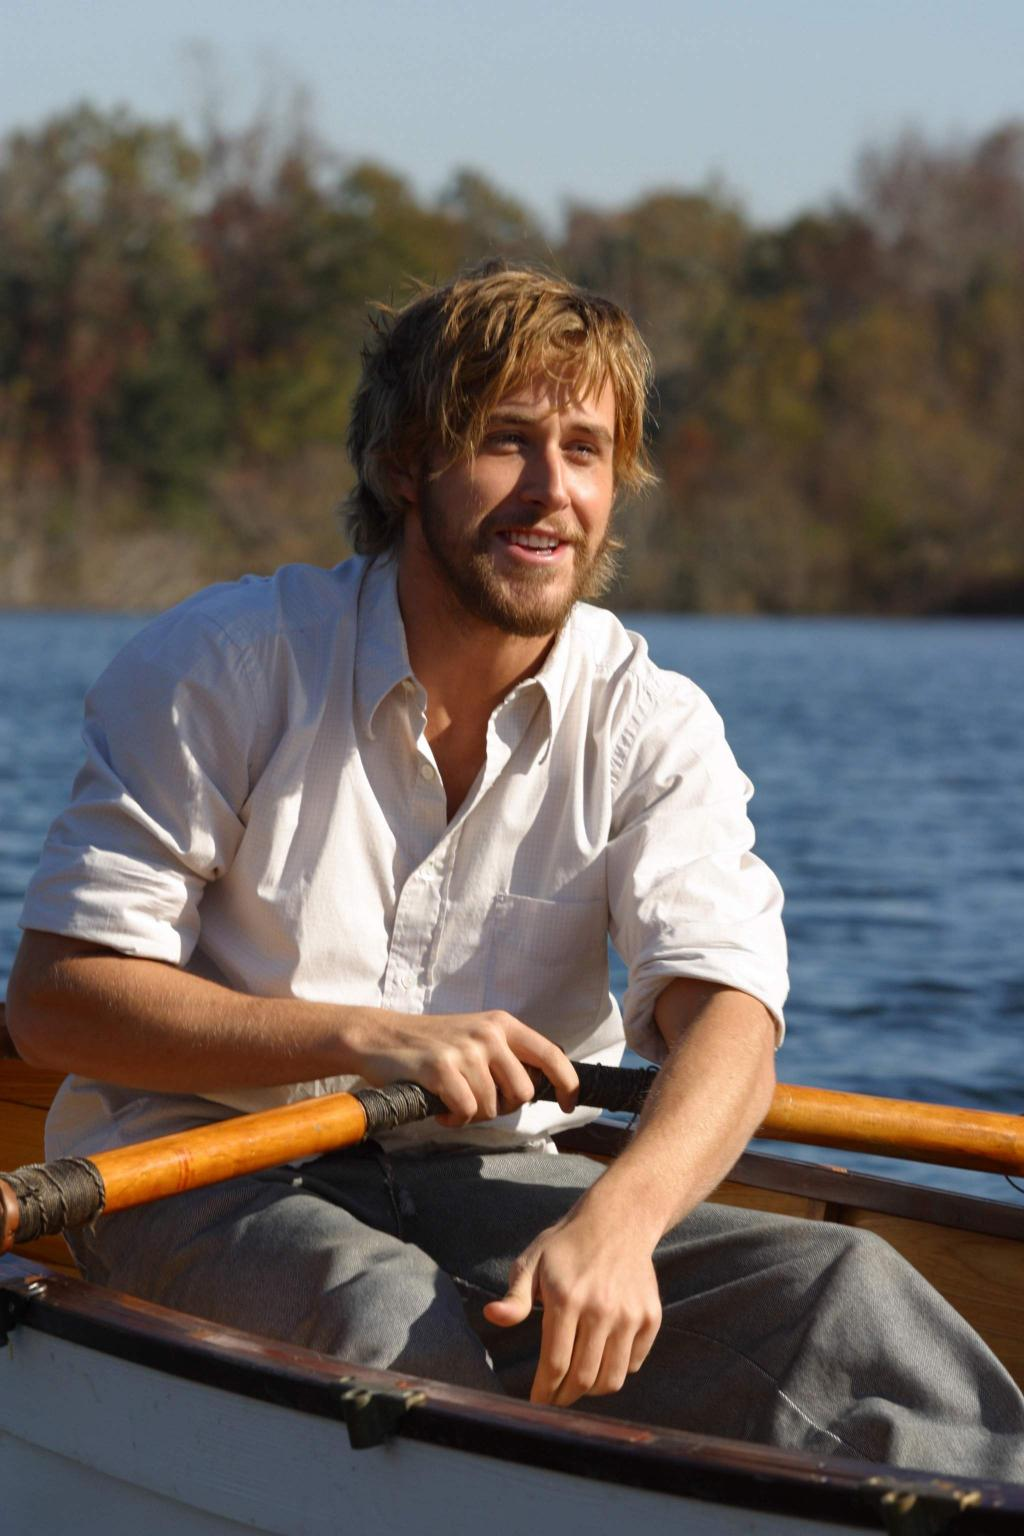 http://2.bp.blogspot.com/-wTflV6be7sc/Tutl8y_QyII/AAAAAAAAAXk/vsZHrrNwsB8/s1600/Ryan+Gosling.jpg